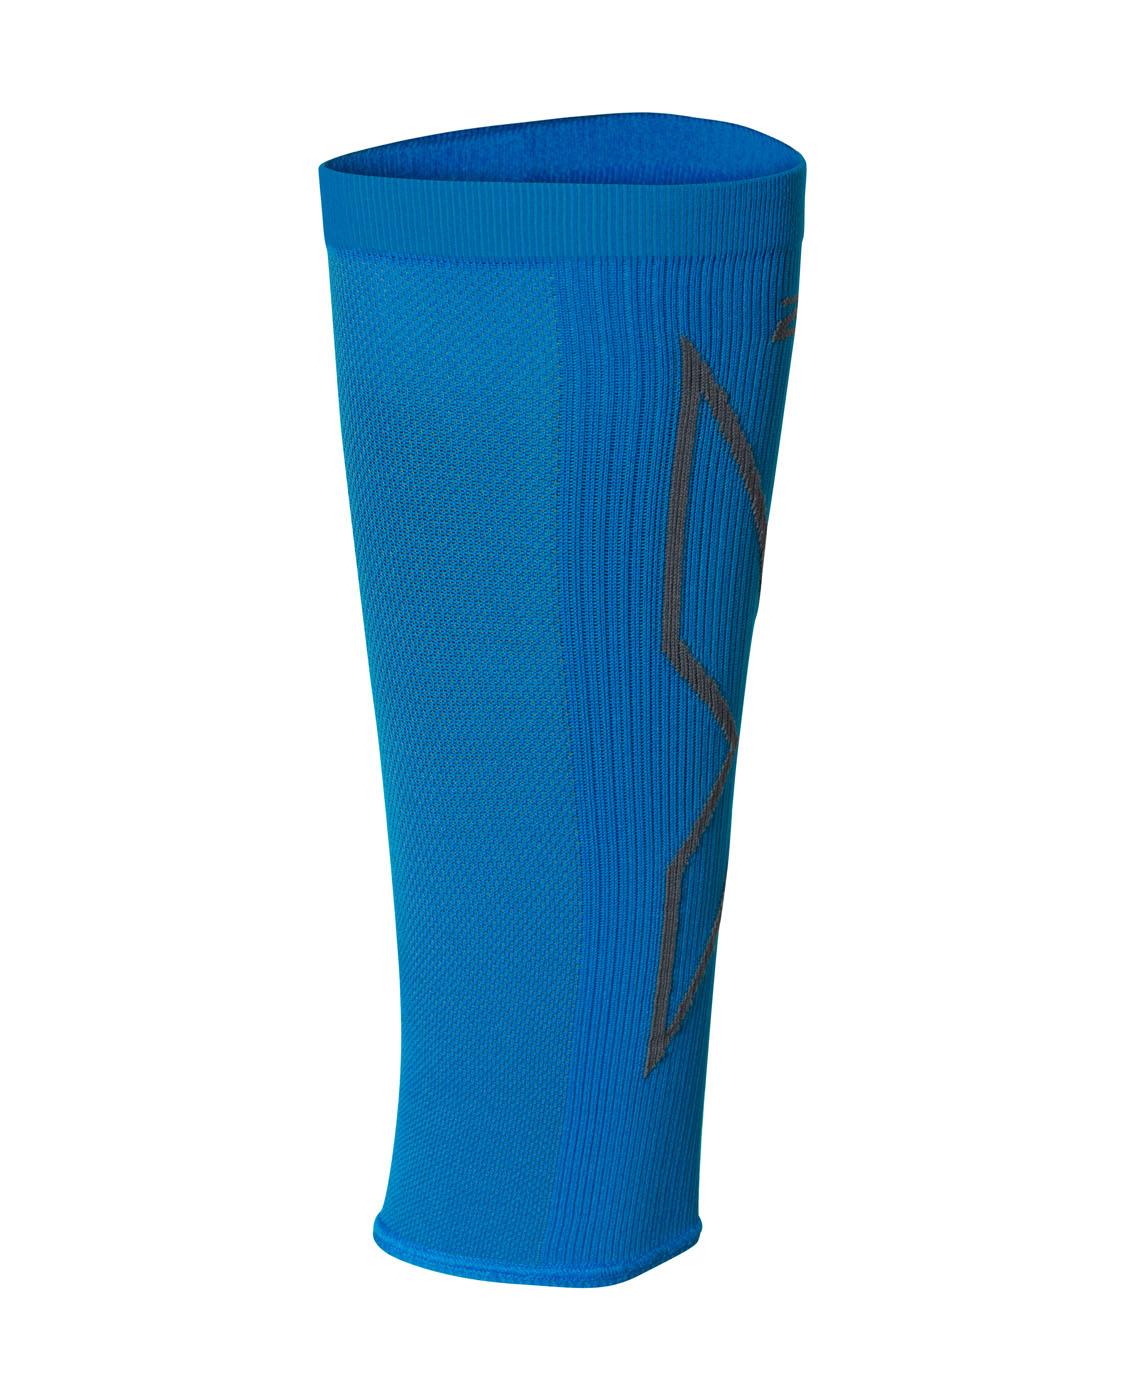 2XU Unisex X Compression Calf Sleeves - Vibrant Blue/Grey